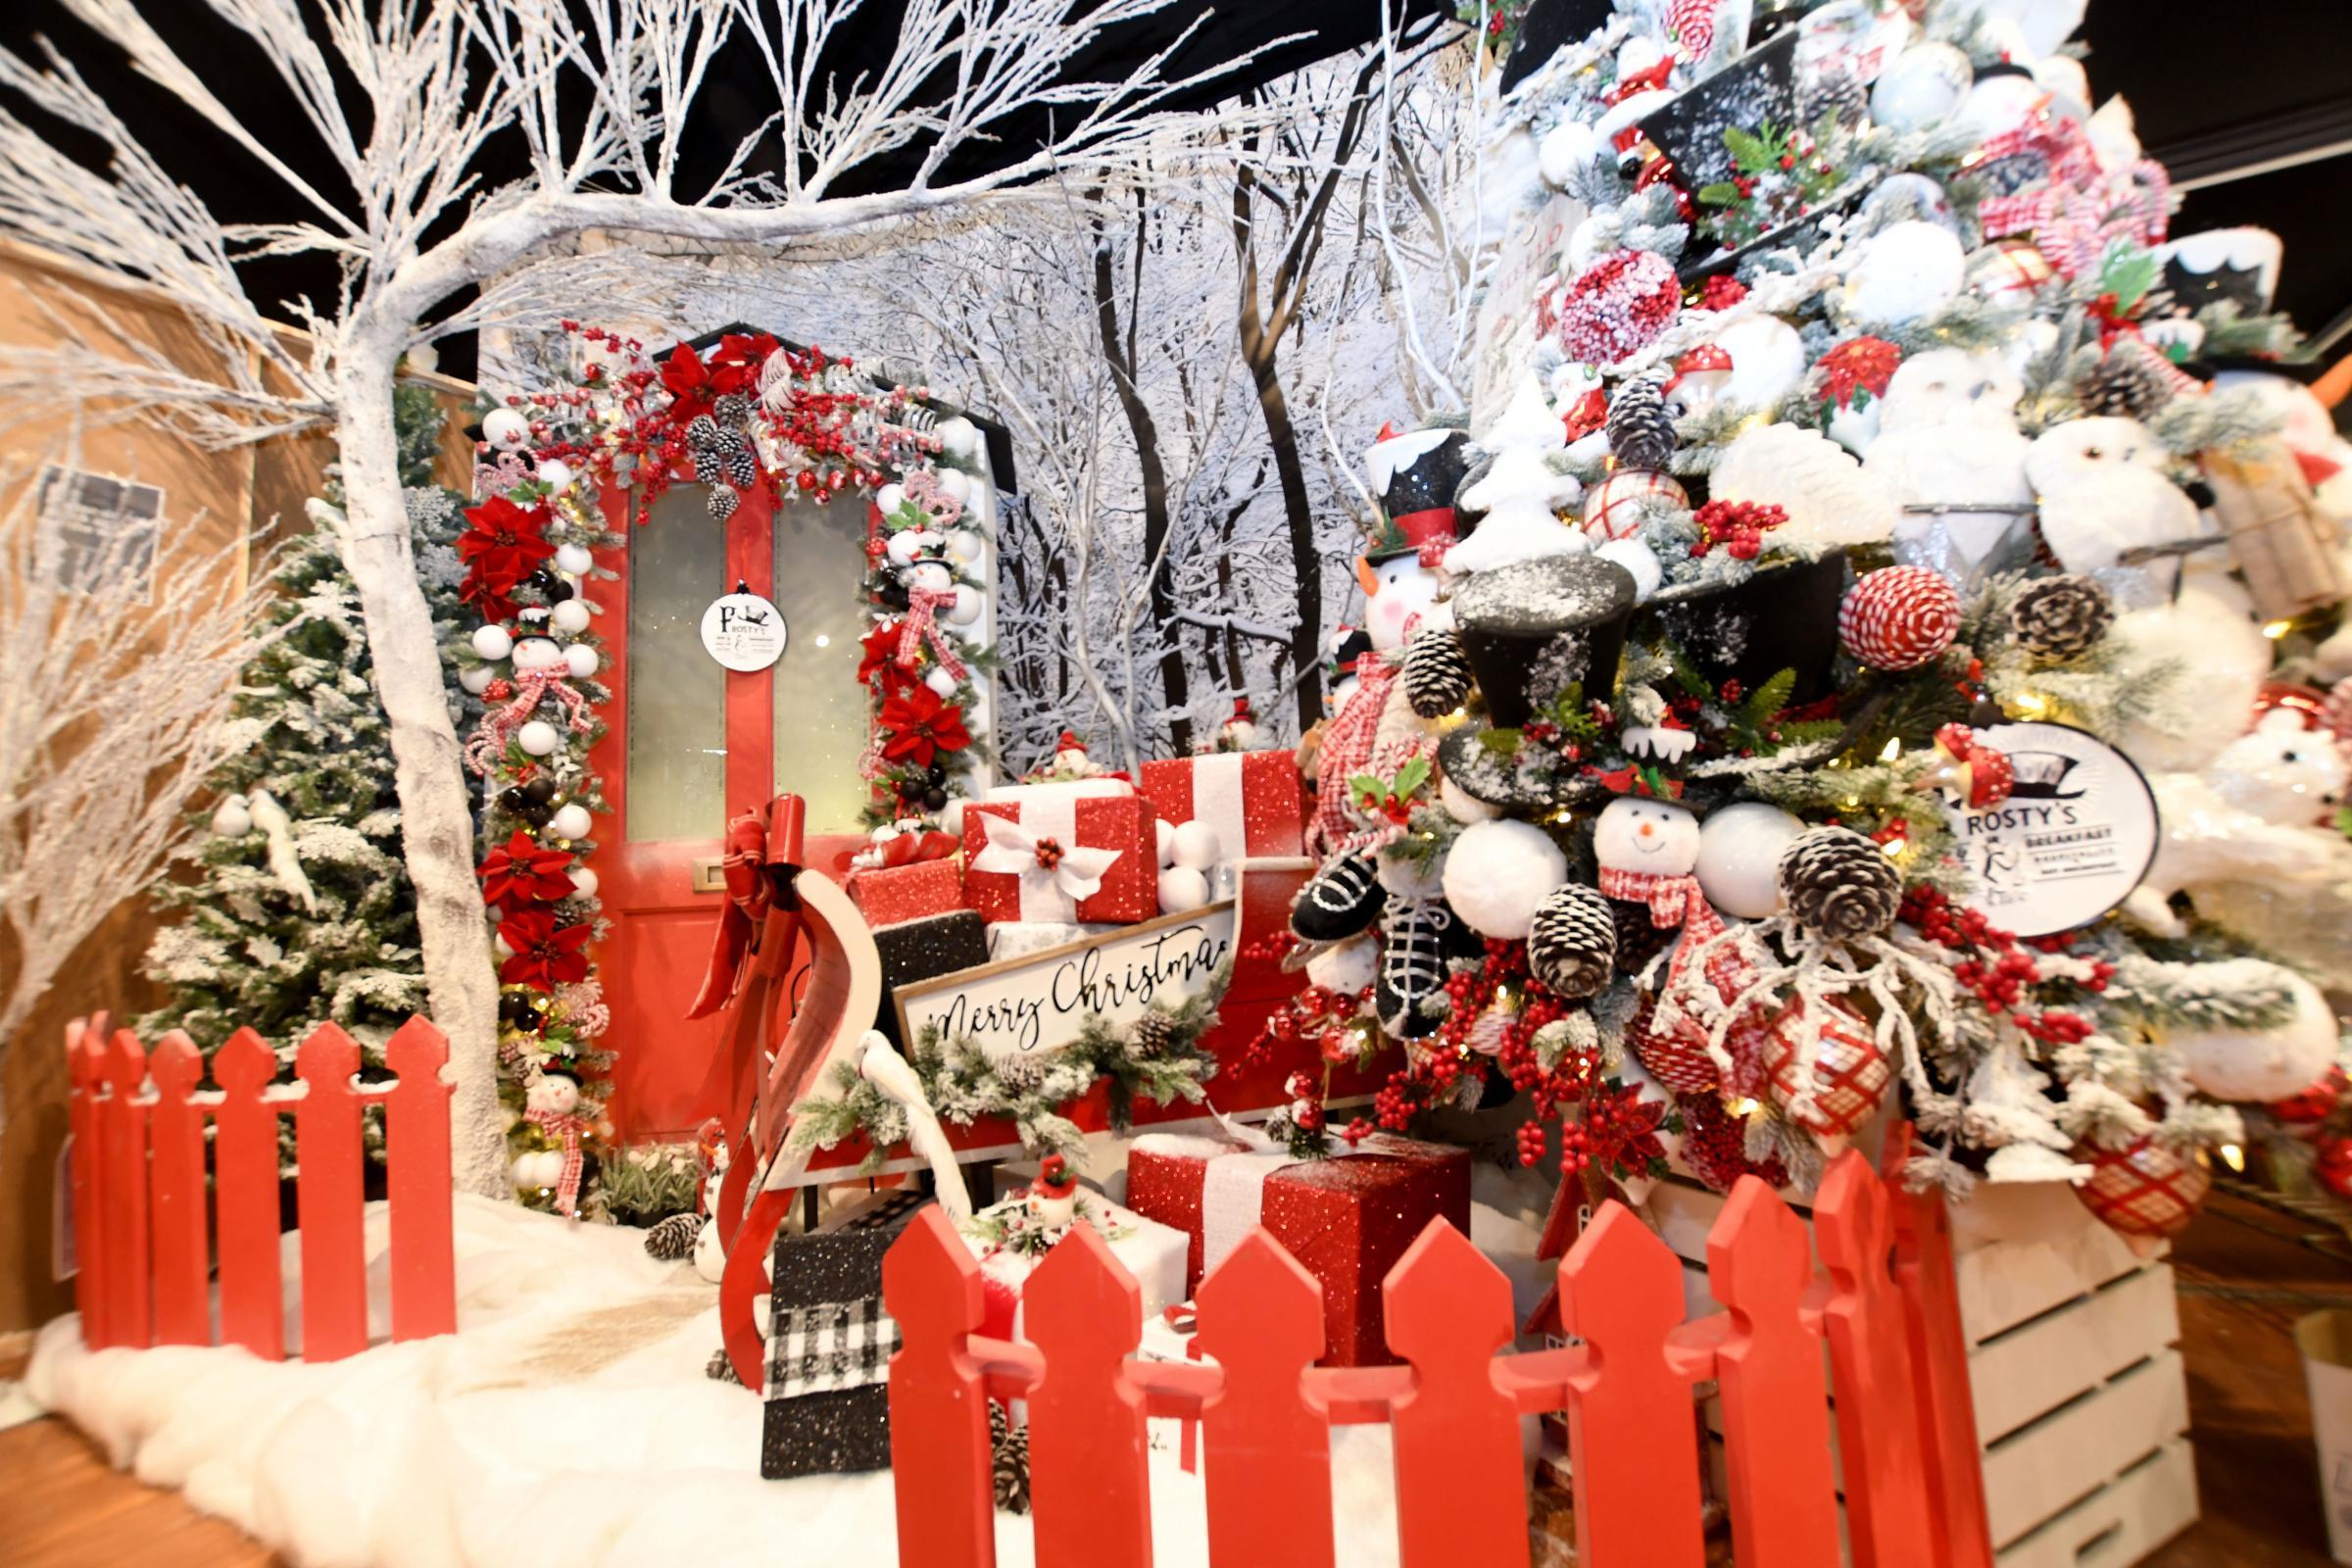 First Look Inside Bents Christmas Winter Wonderland Warrington Guardian